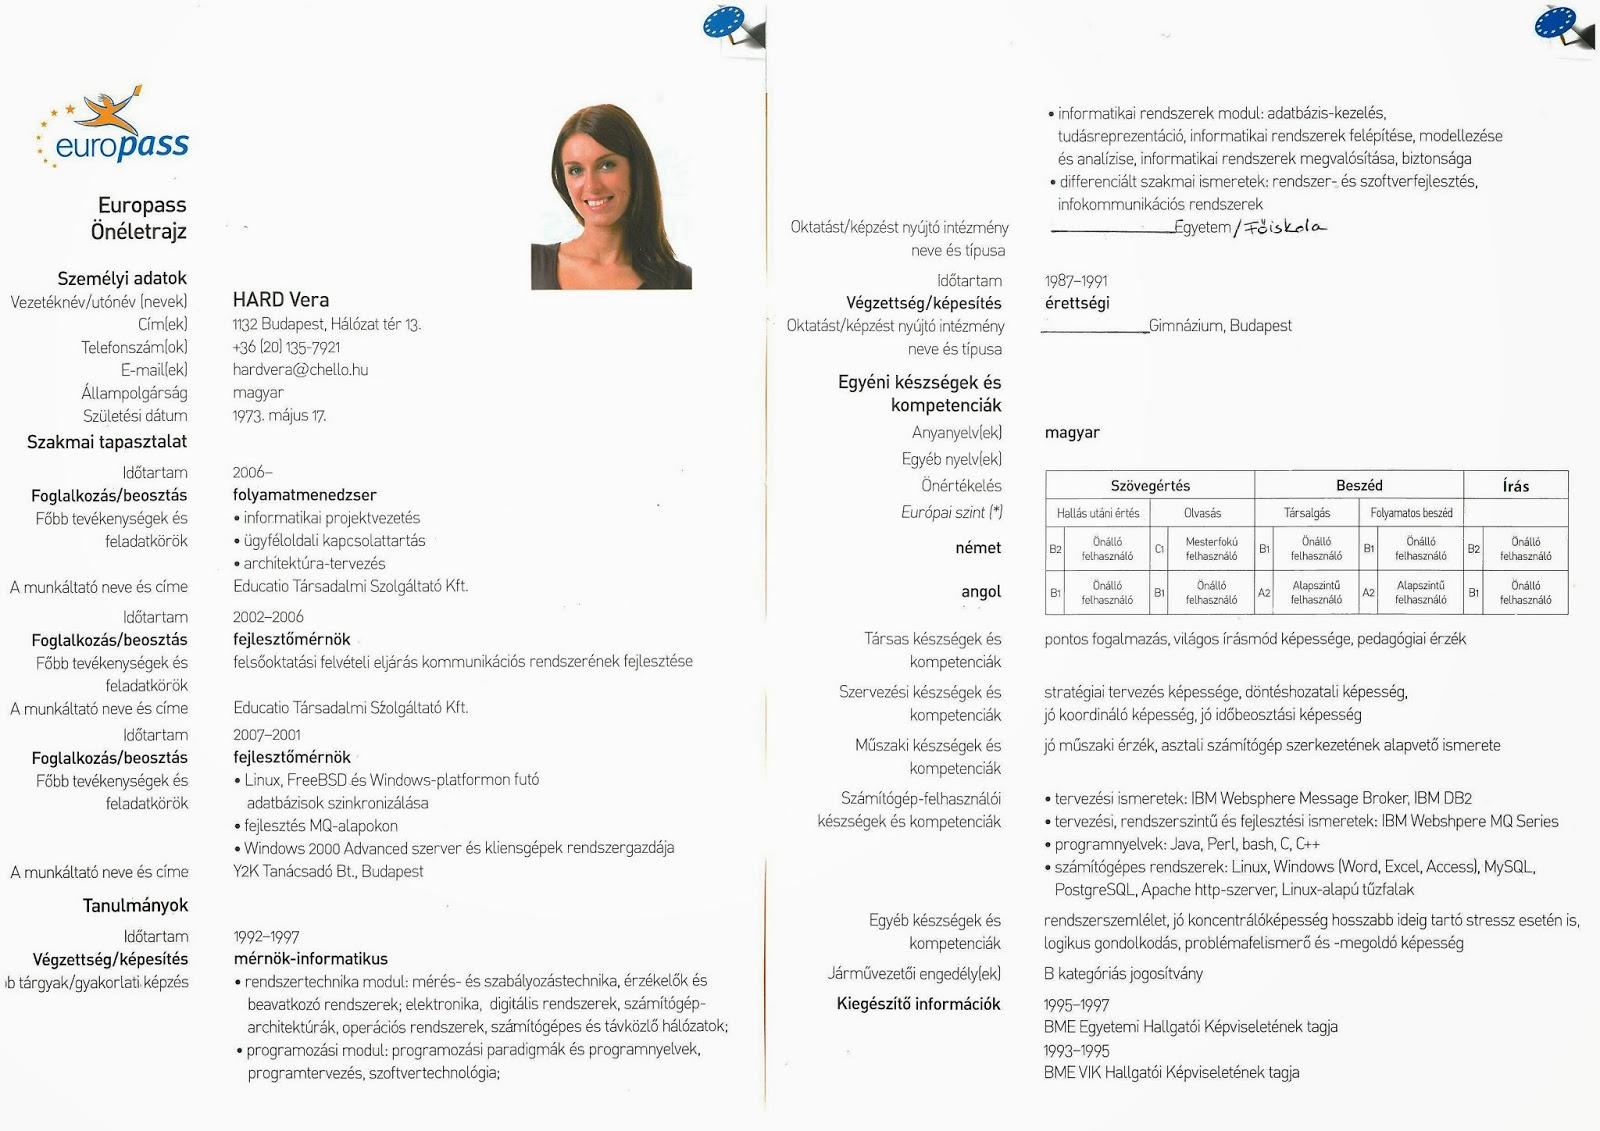 Europass cv example in romana cv maker create professional europass cv example in romana 193ll225skeres233si tan225csok hogyan yelopaper Images